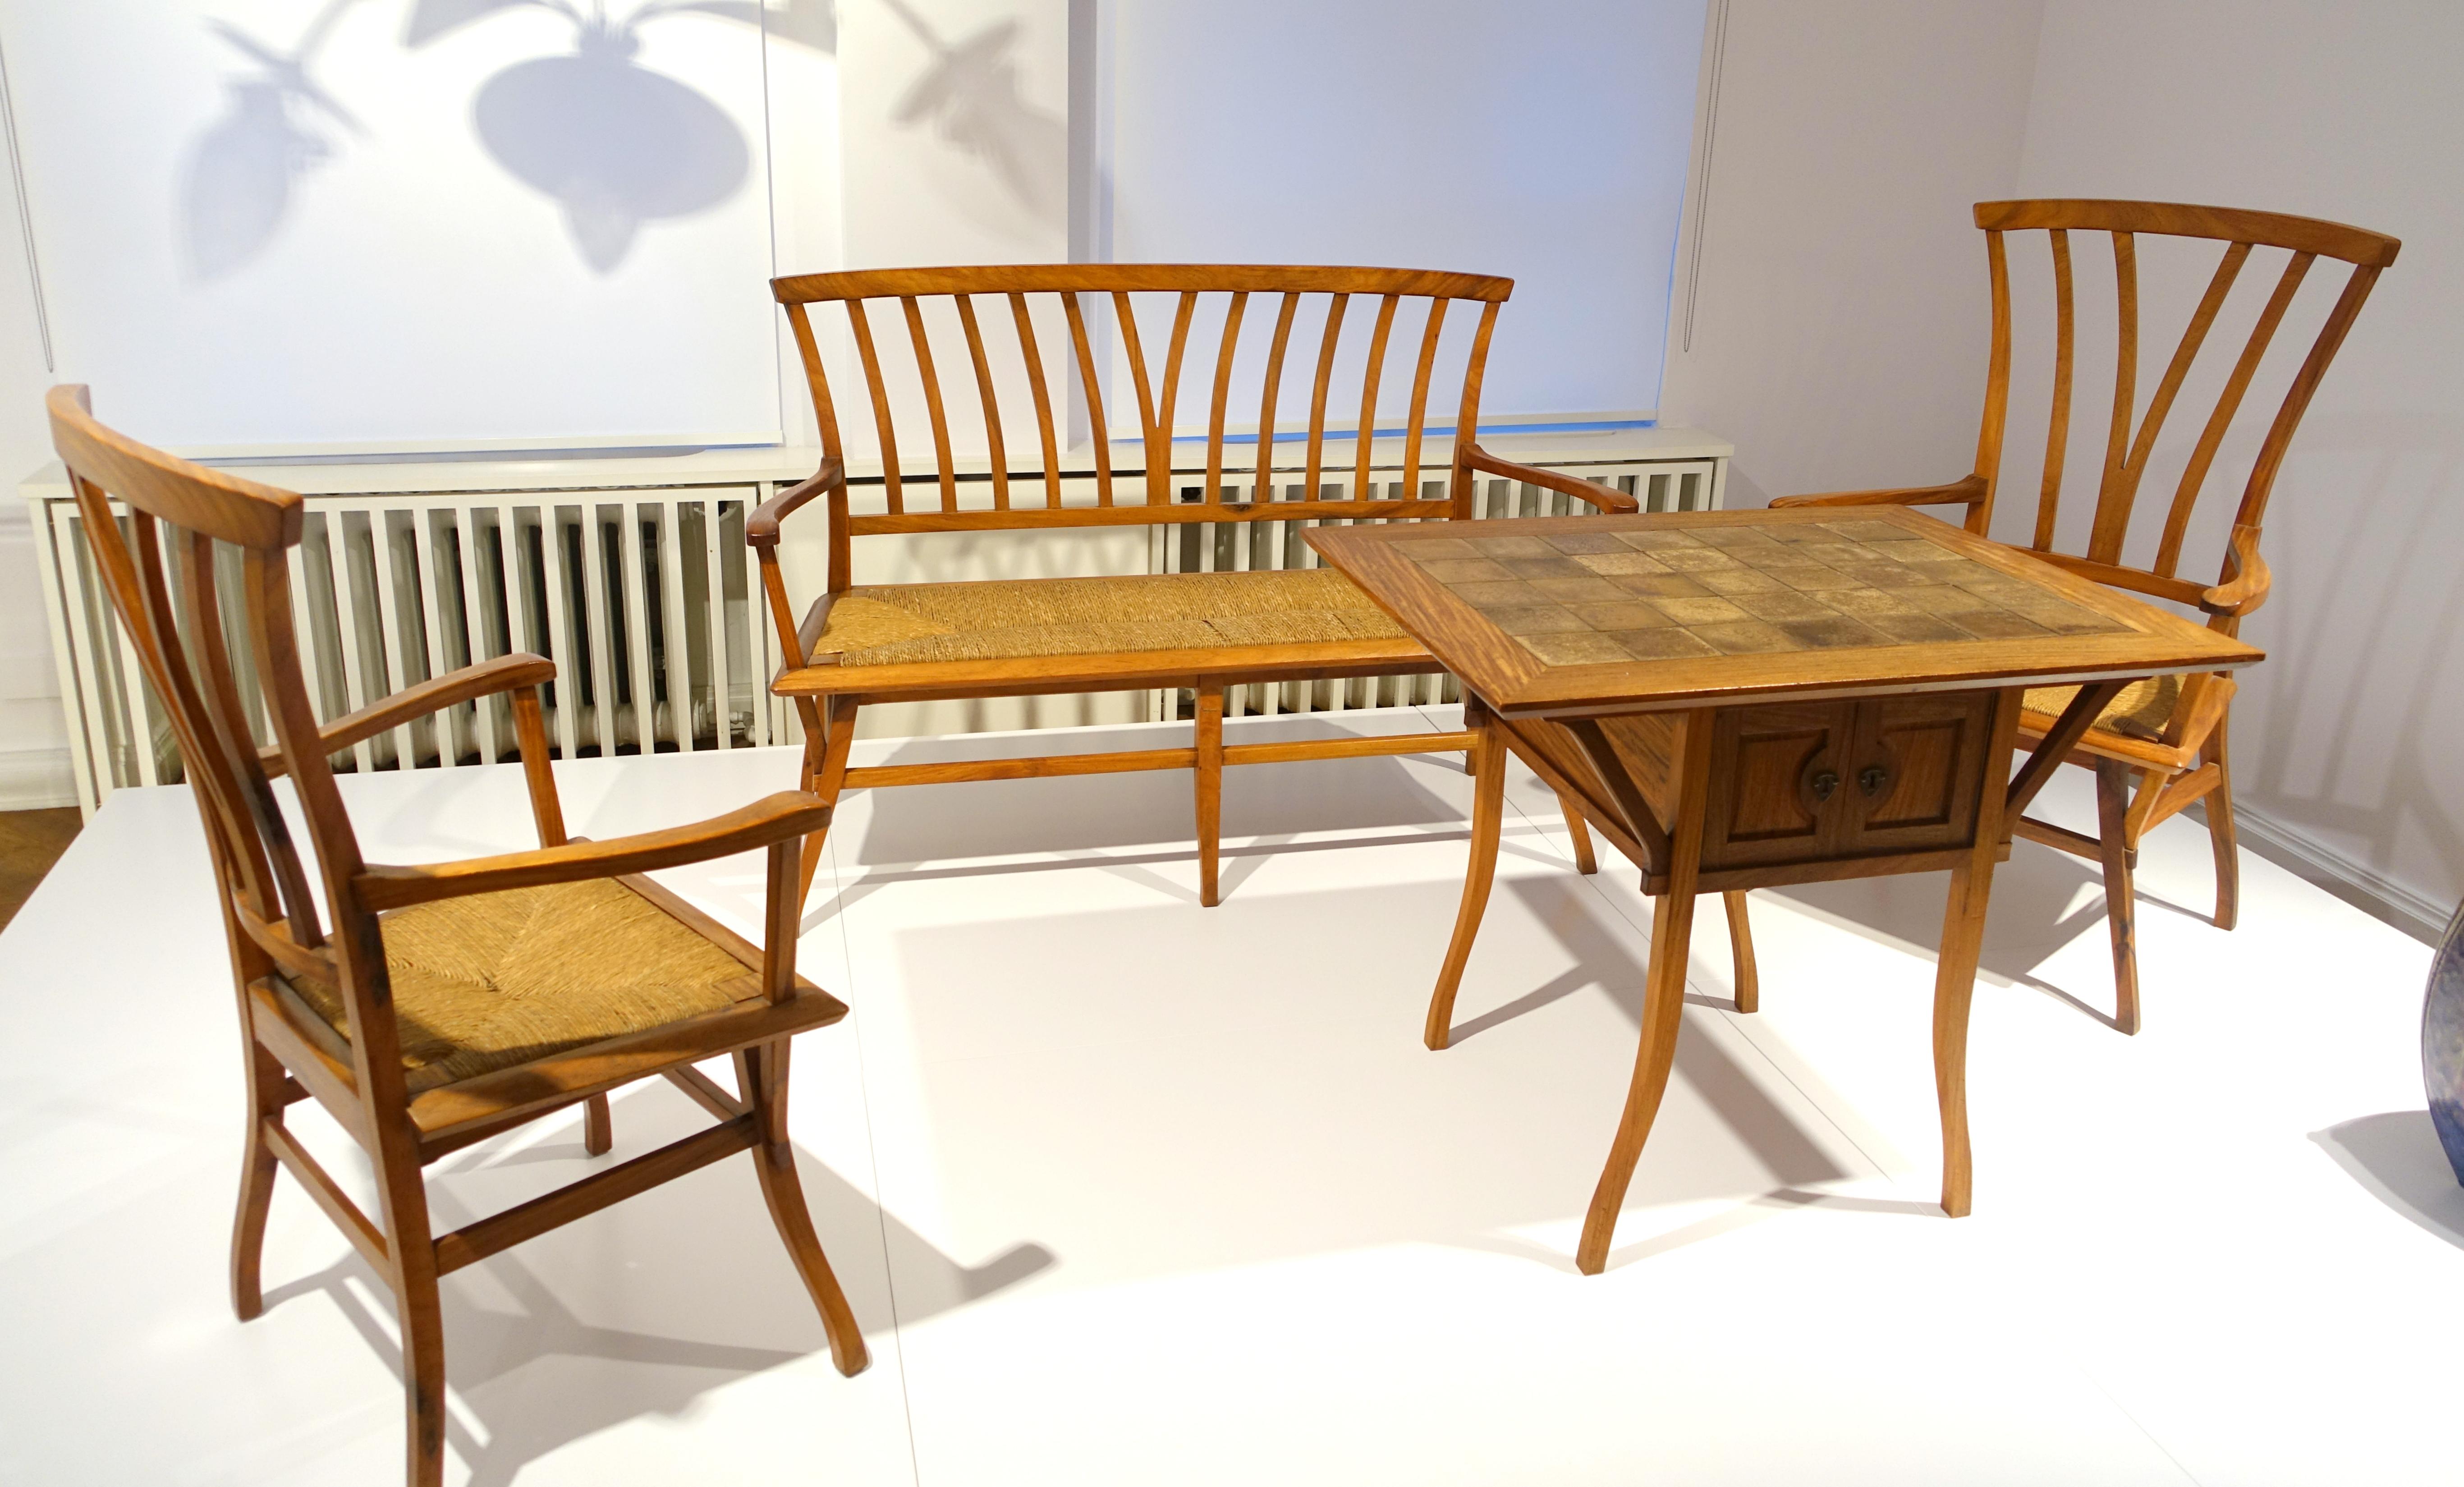 File Furniture From The Bloemenwerf House Henry Van De Velde 1895 Bubinga Wood Cane Ceramic